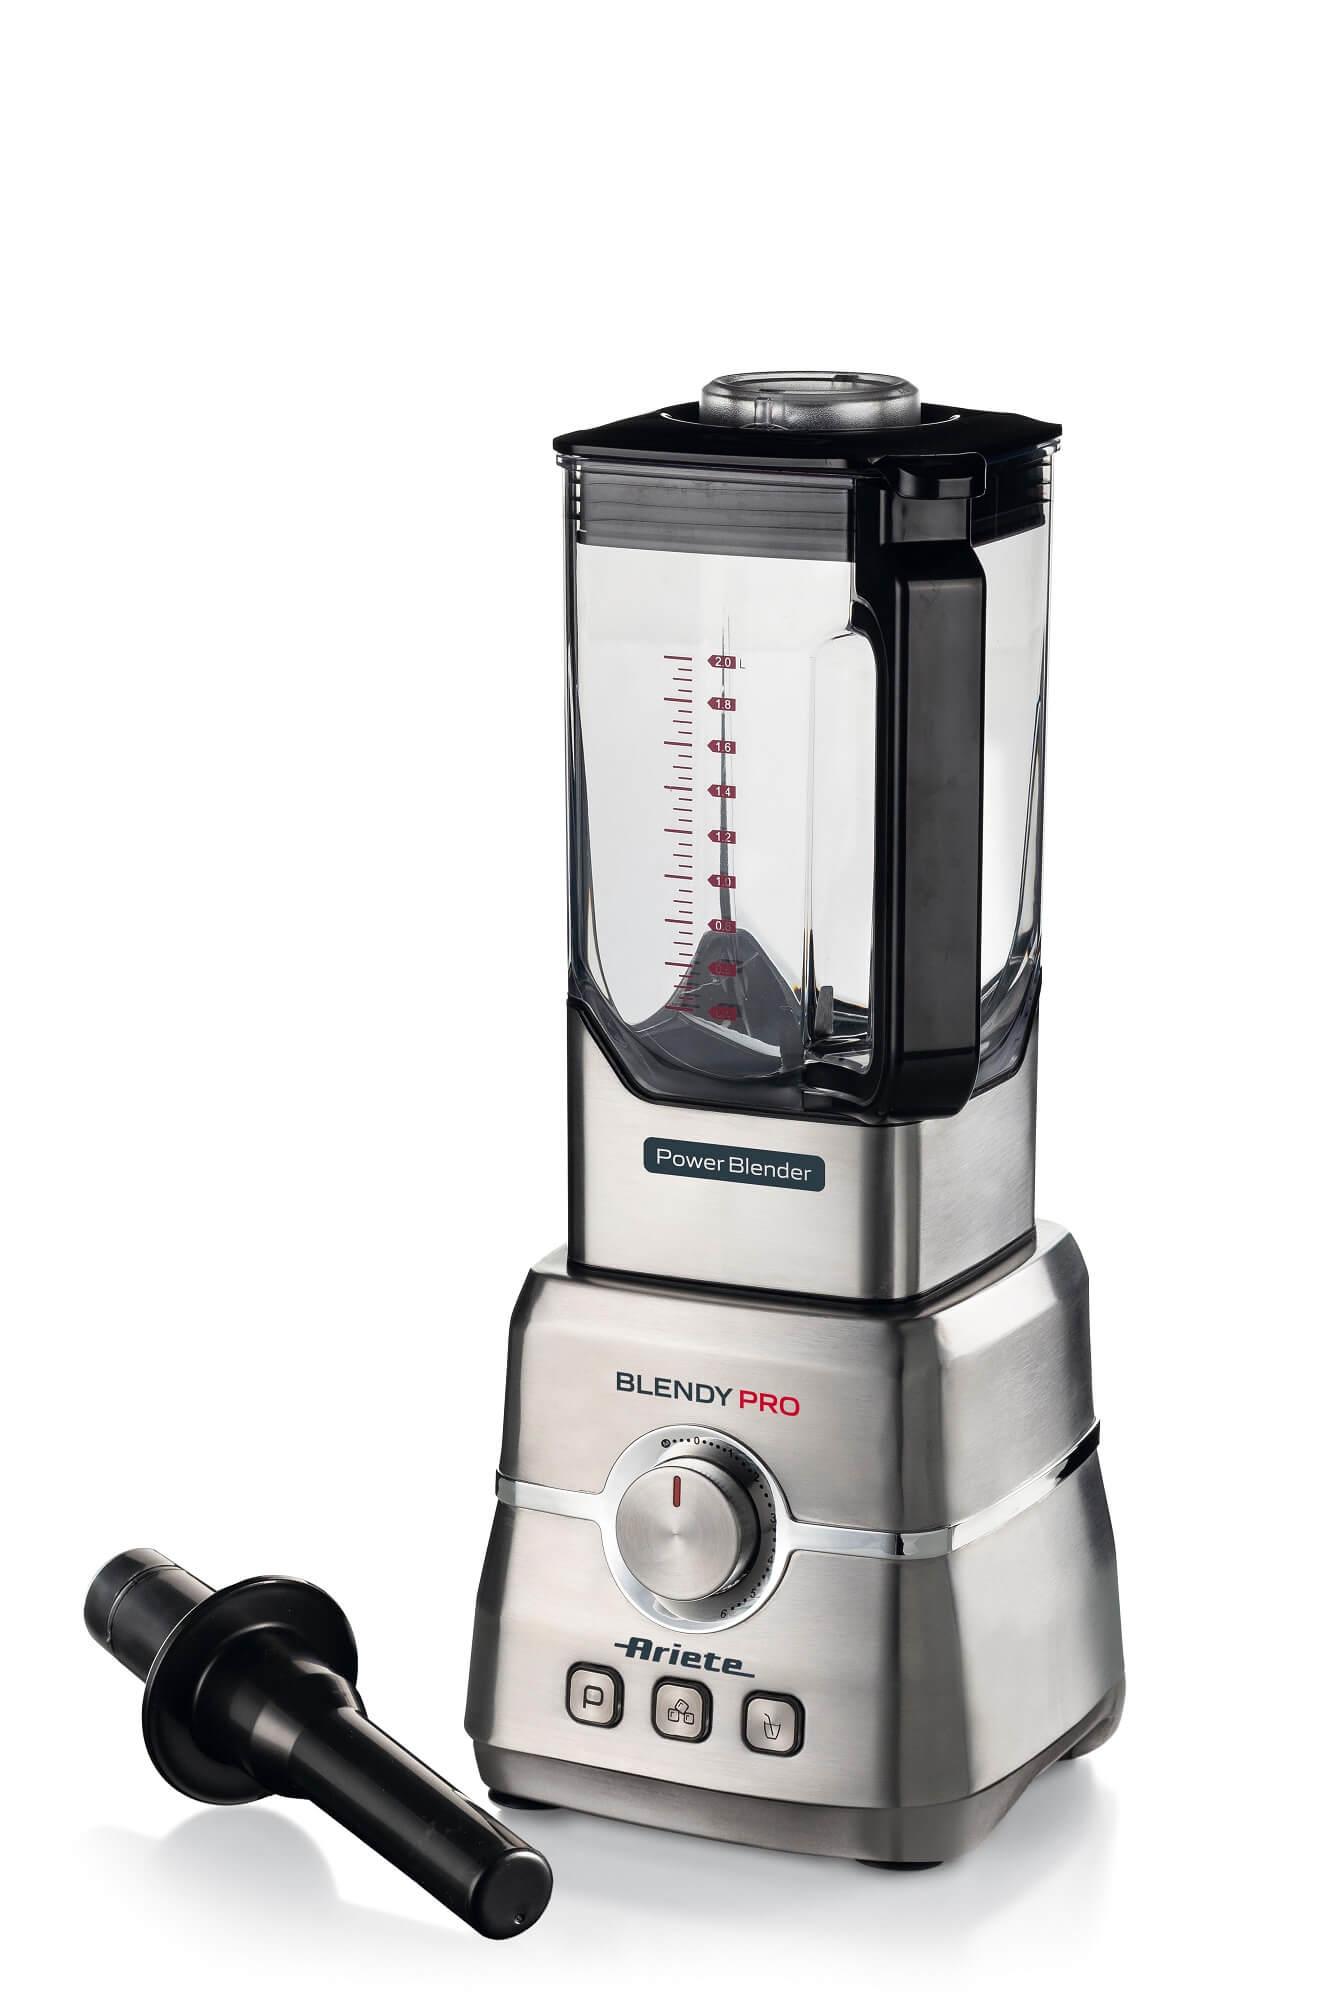 Ariete  577 Blendy Pro 2000W Blenderis